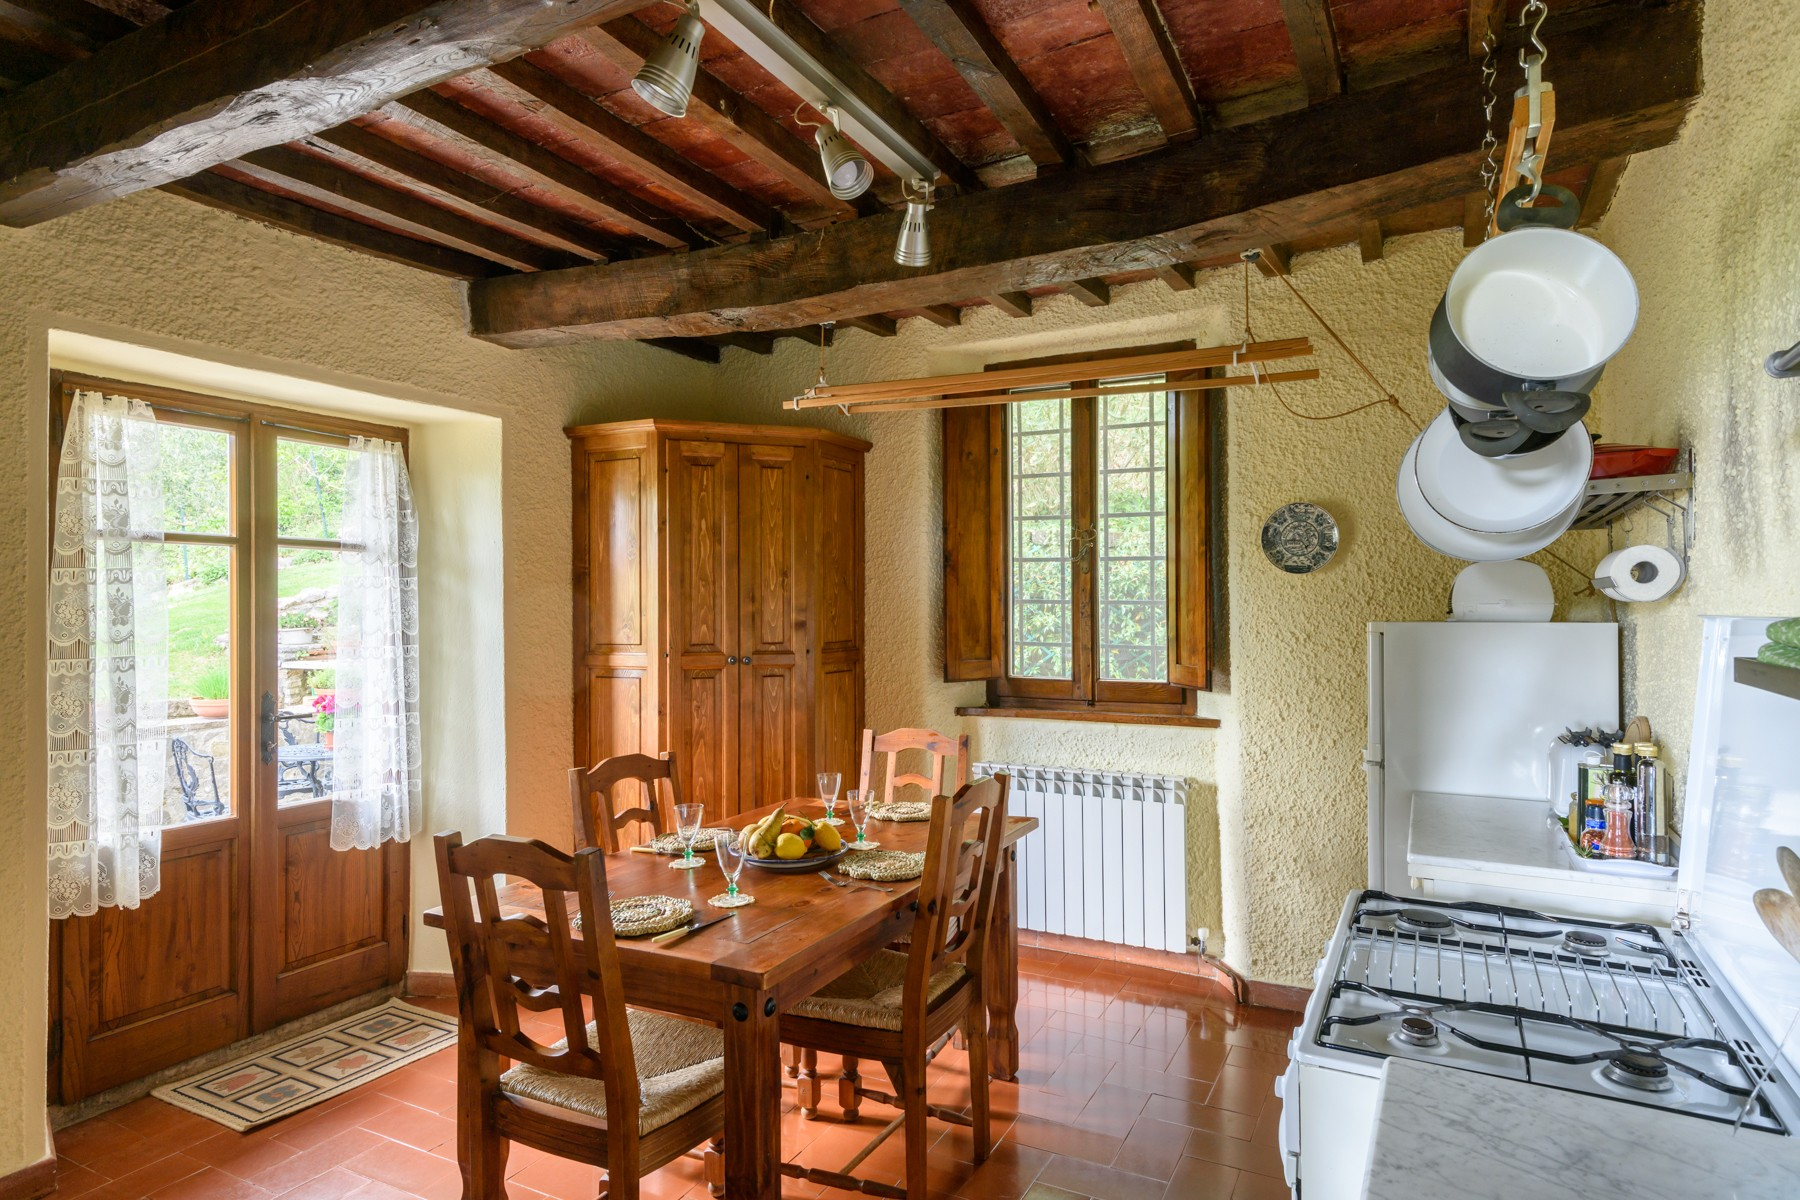 Casa indipendente in Vendita a Semproniano: 4 locali, 220 mq - Foto 12